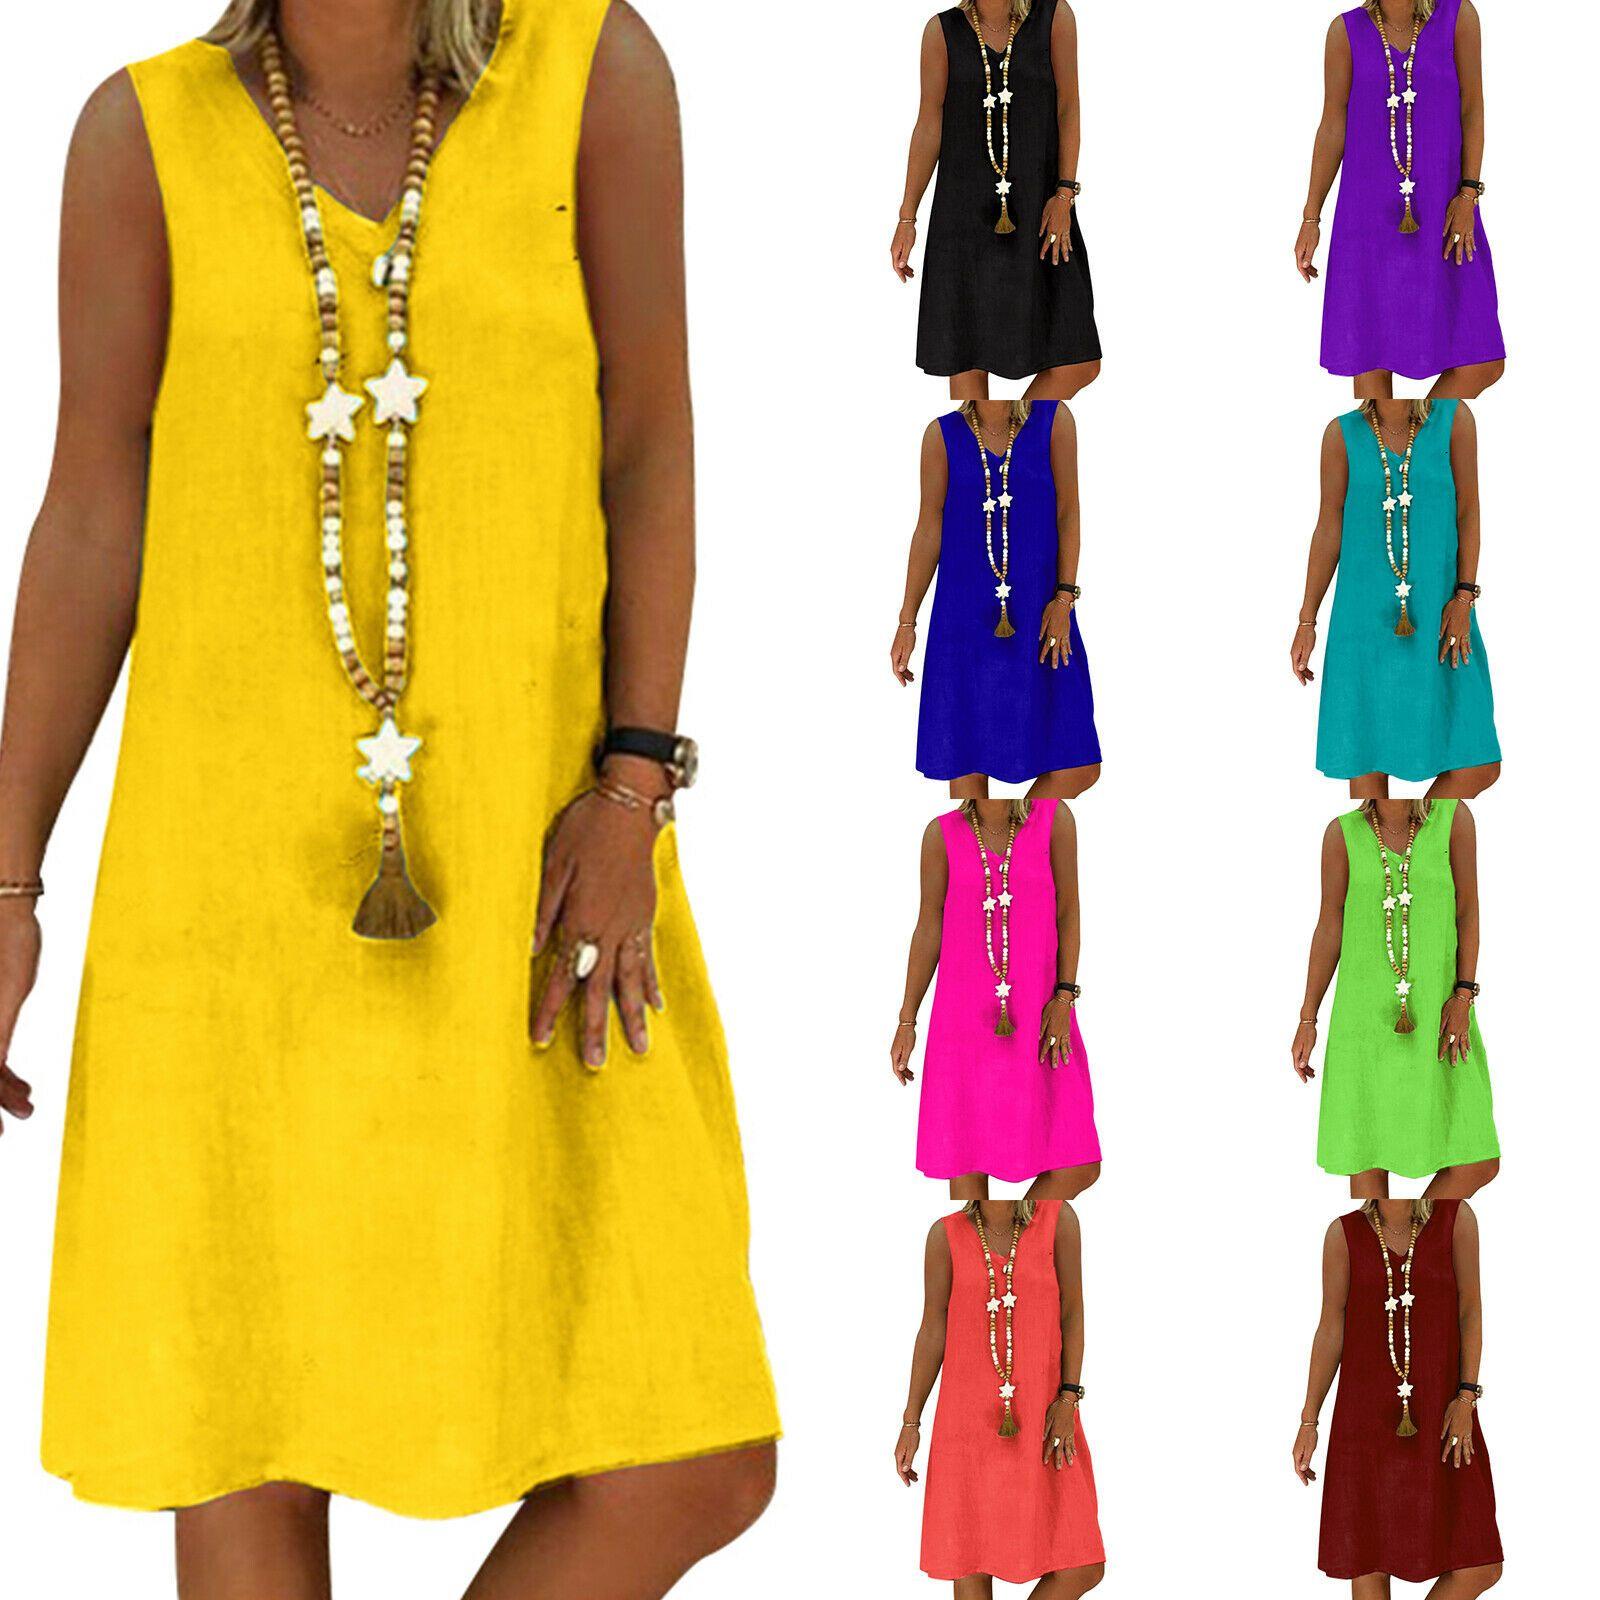 Women Summer Vest Sleeveless Sundress Tank Top Casual Loose Midi Dress Plus Size In 2020 Midi Dress Plus Size Loose Midi Dress Casual Summer Dresses [ 1600 x 1600 Pixel ]